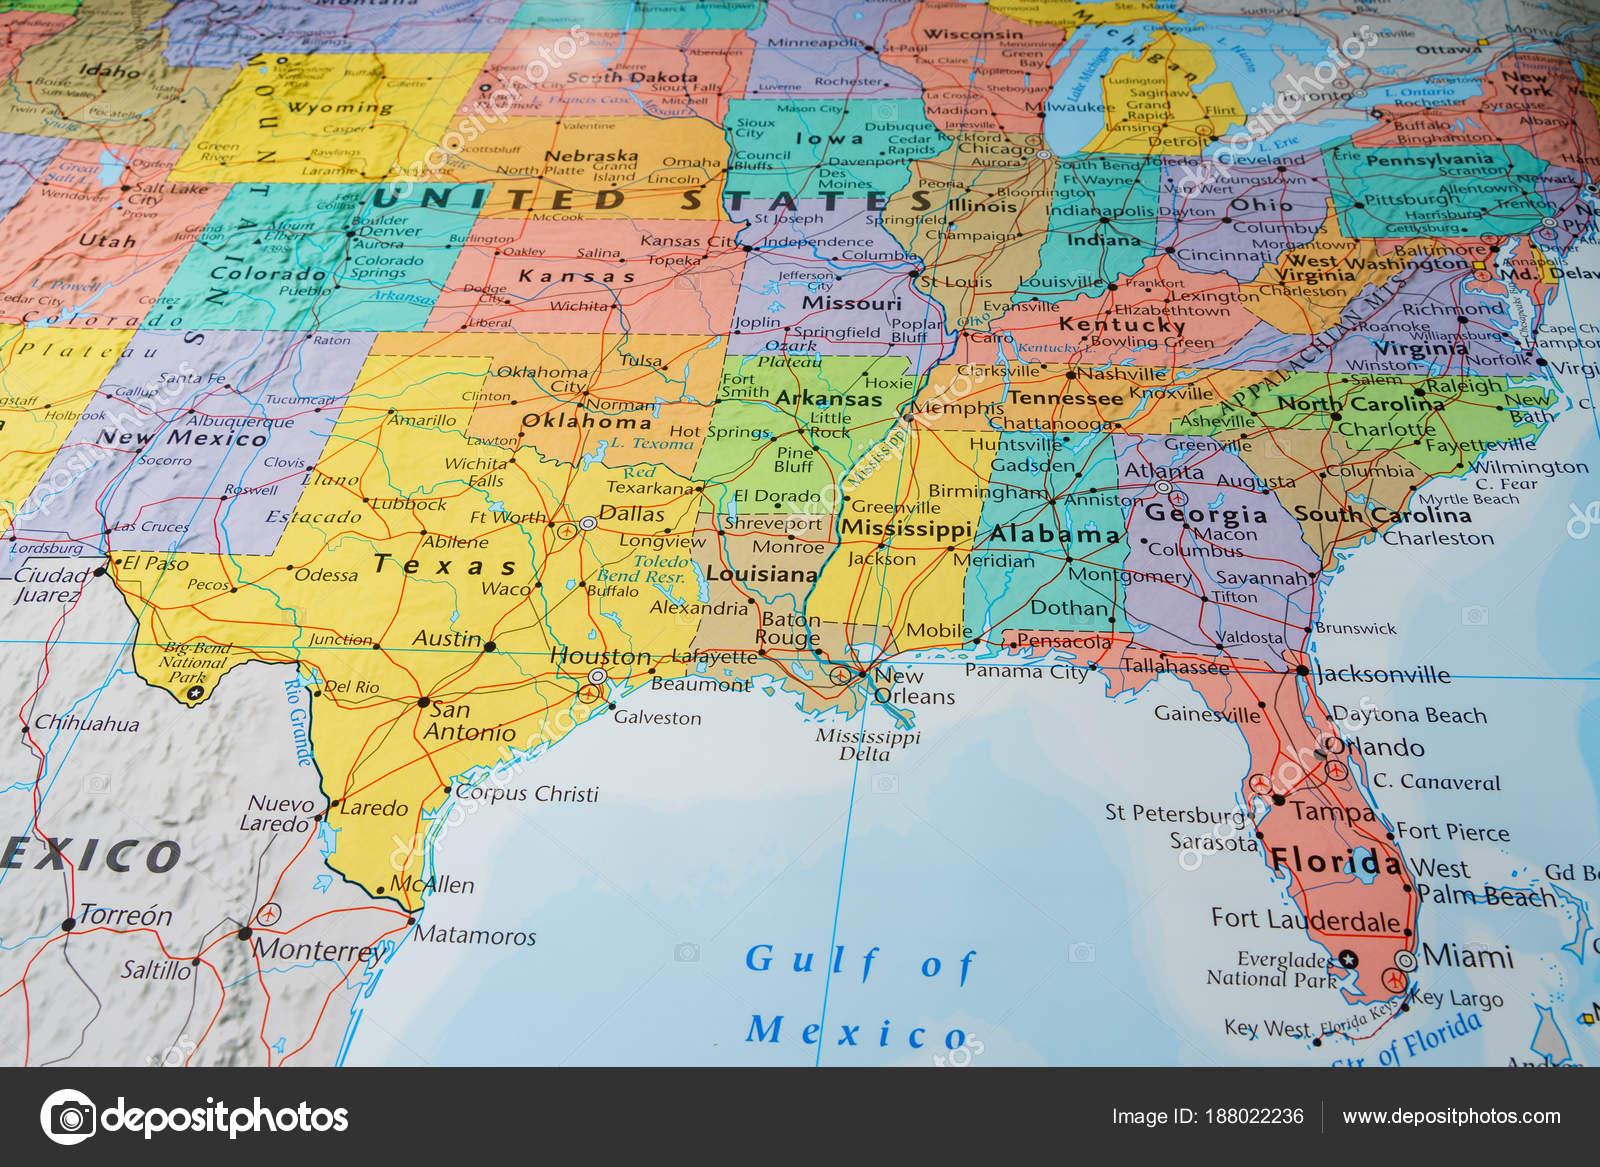 South Usa Staaten Auf Der Karte — Stockfoto © aallm #188022236